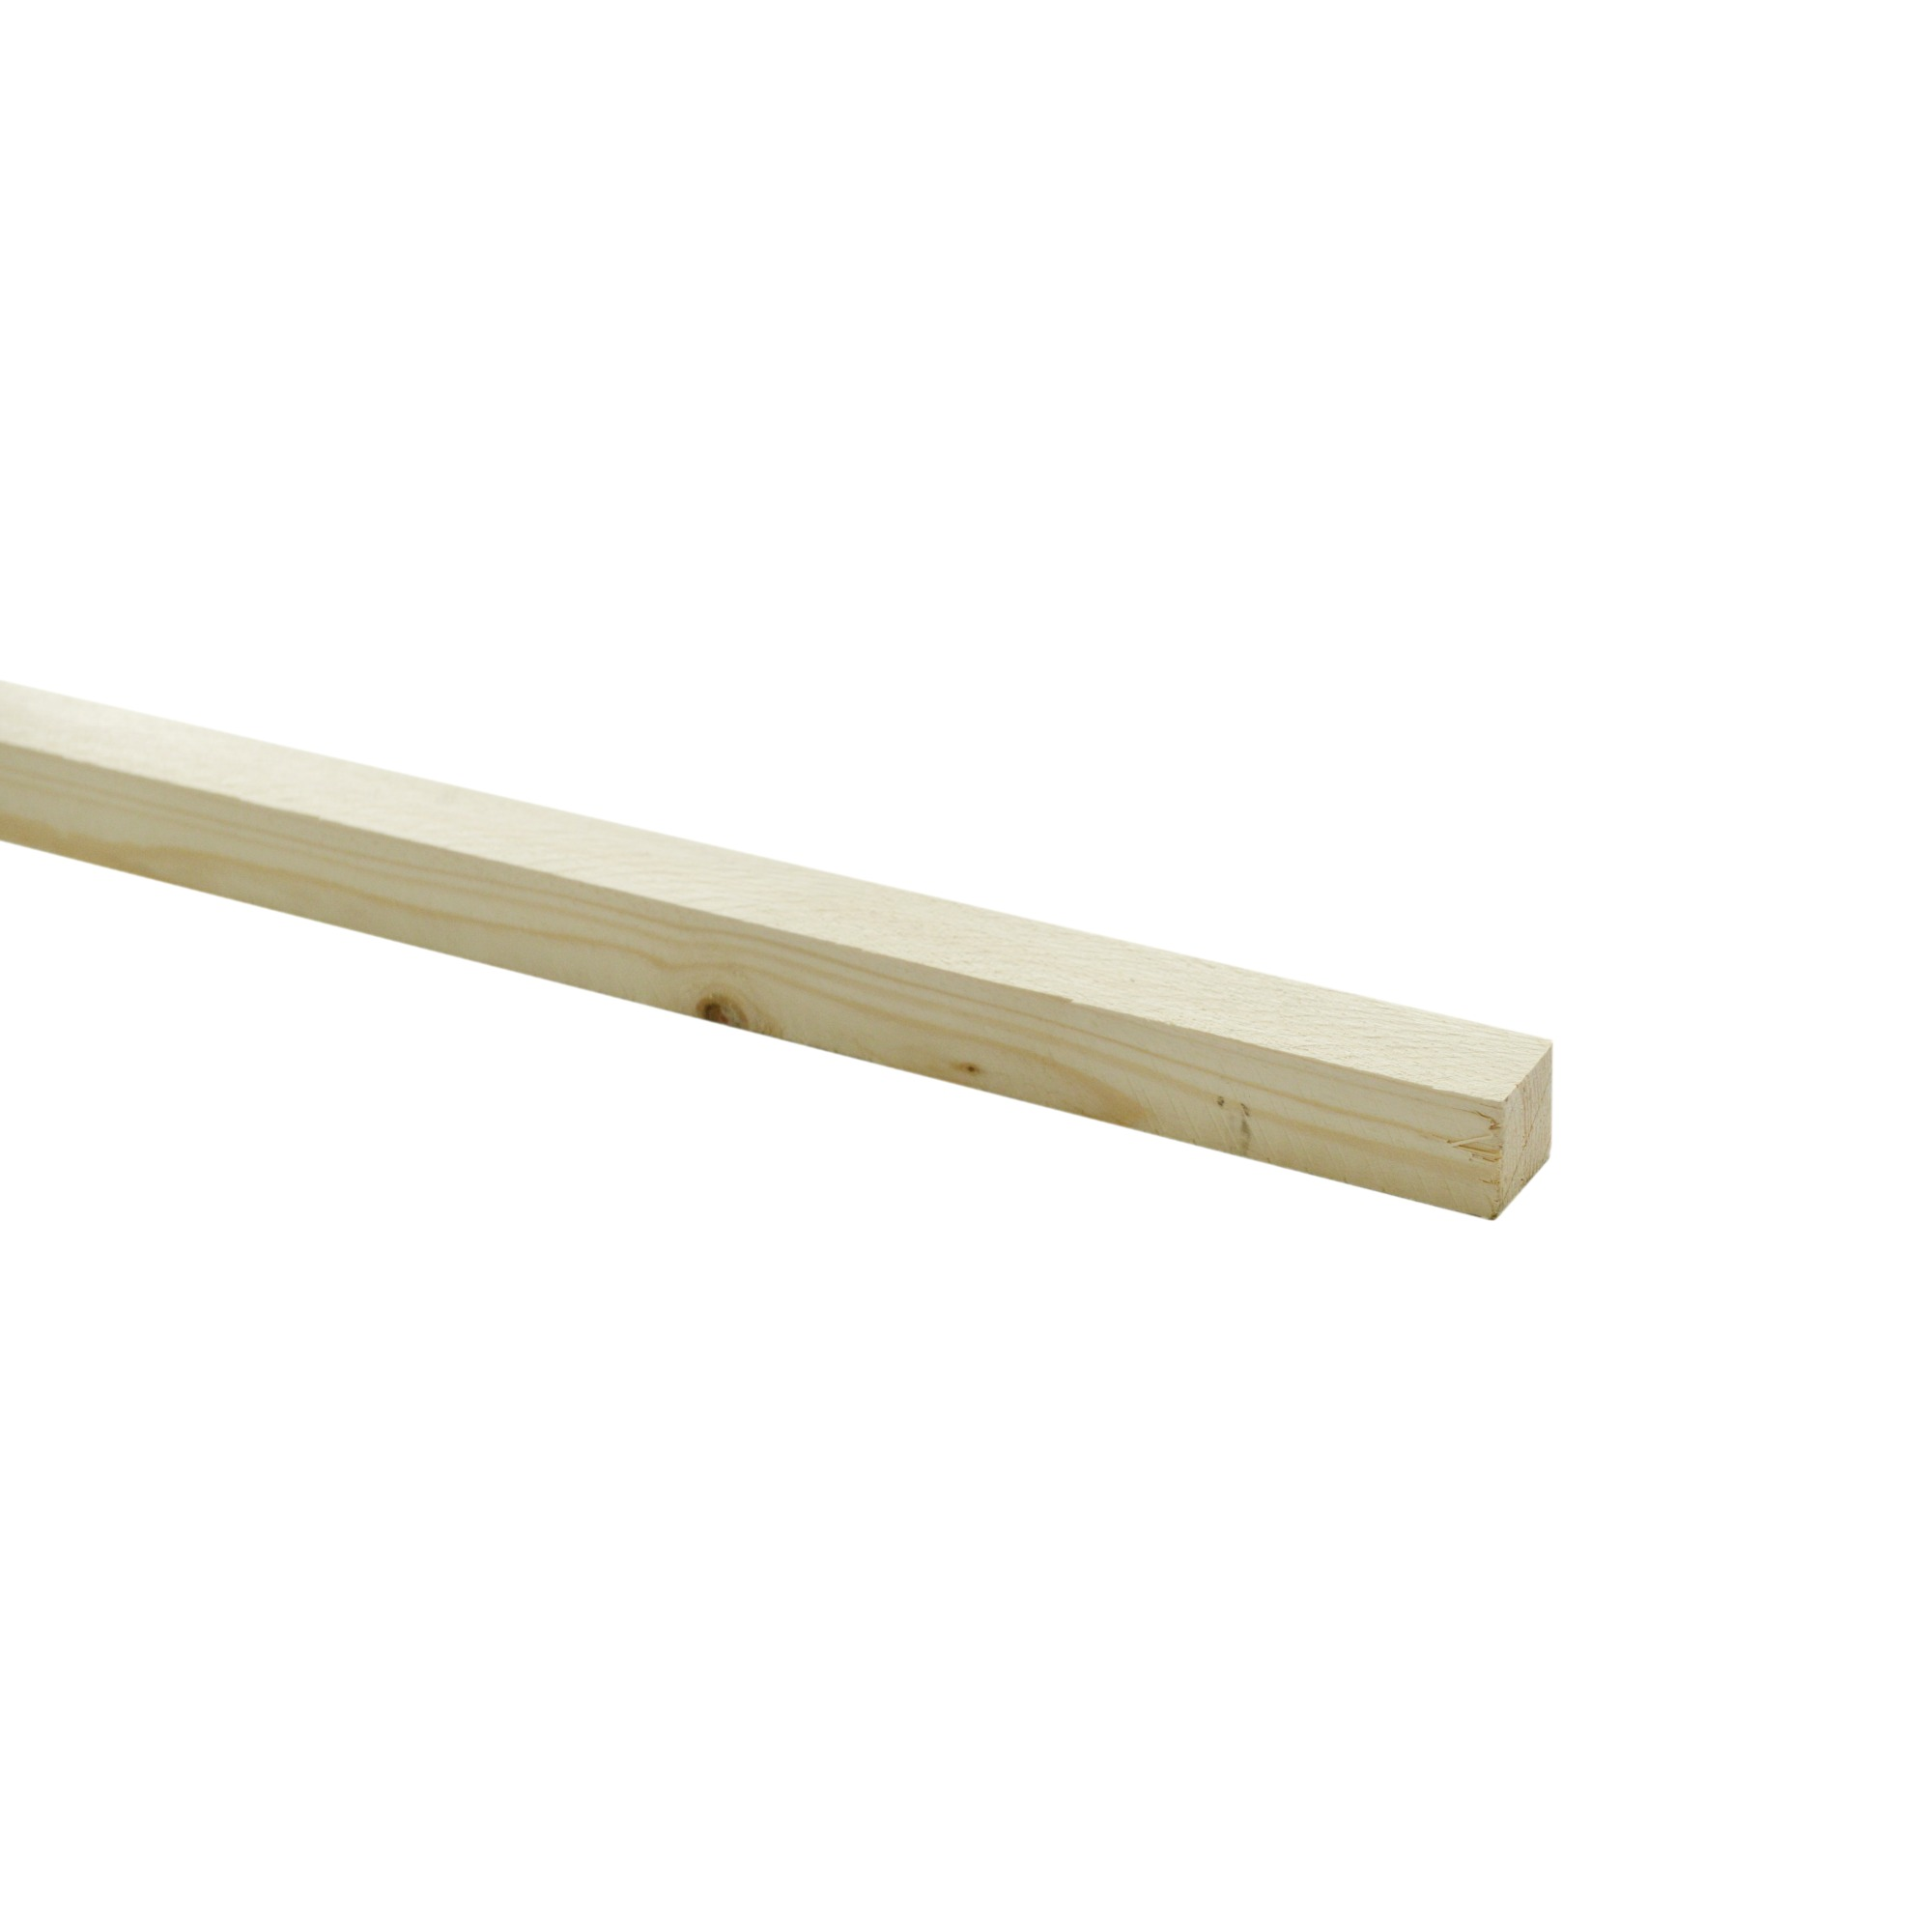 Steigerhouten lat ca. 30x30 mm, lengte 250 cm onbehandeld